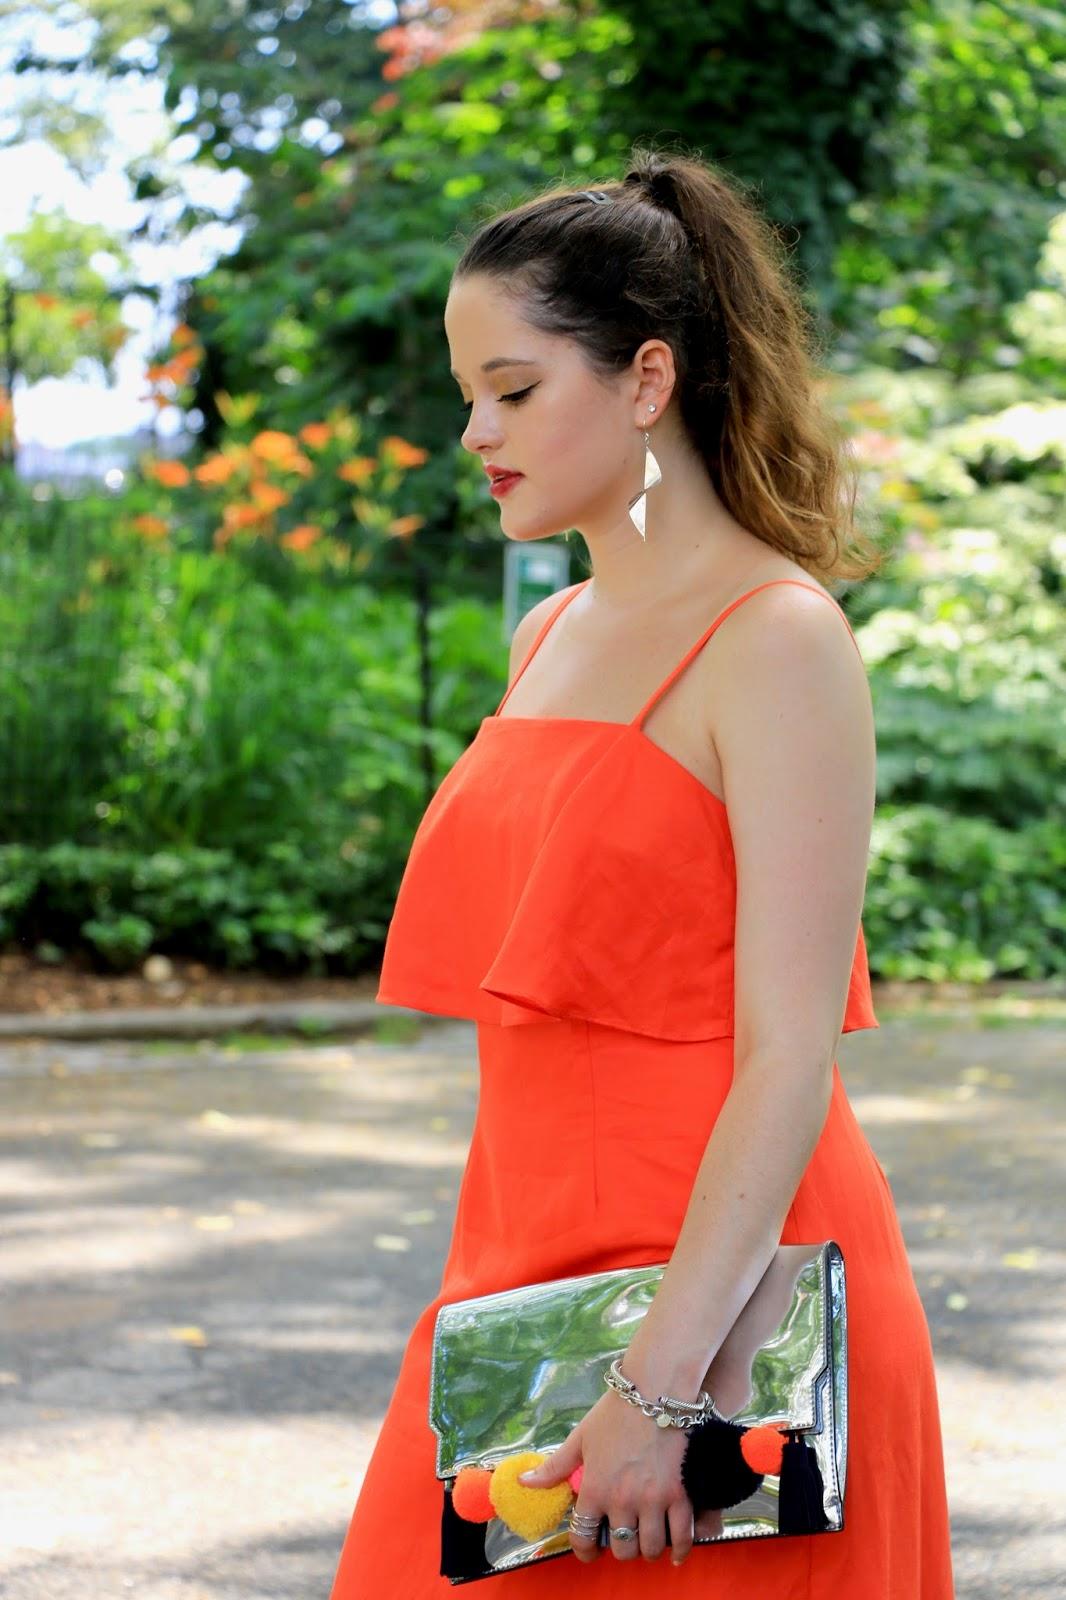 Fashion blogger Kathleen Harper of Kat's Fashion Fix showing wedding outfit ideas